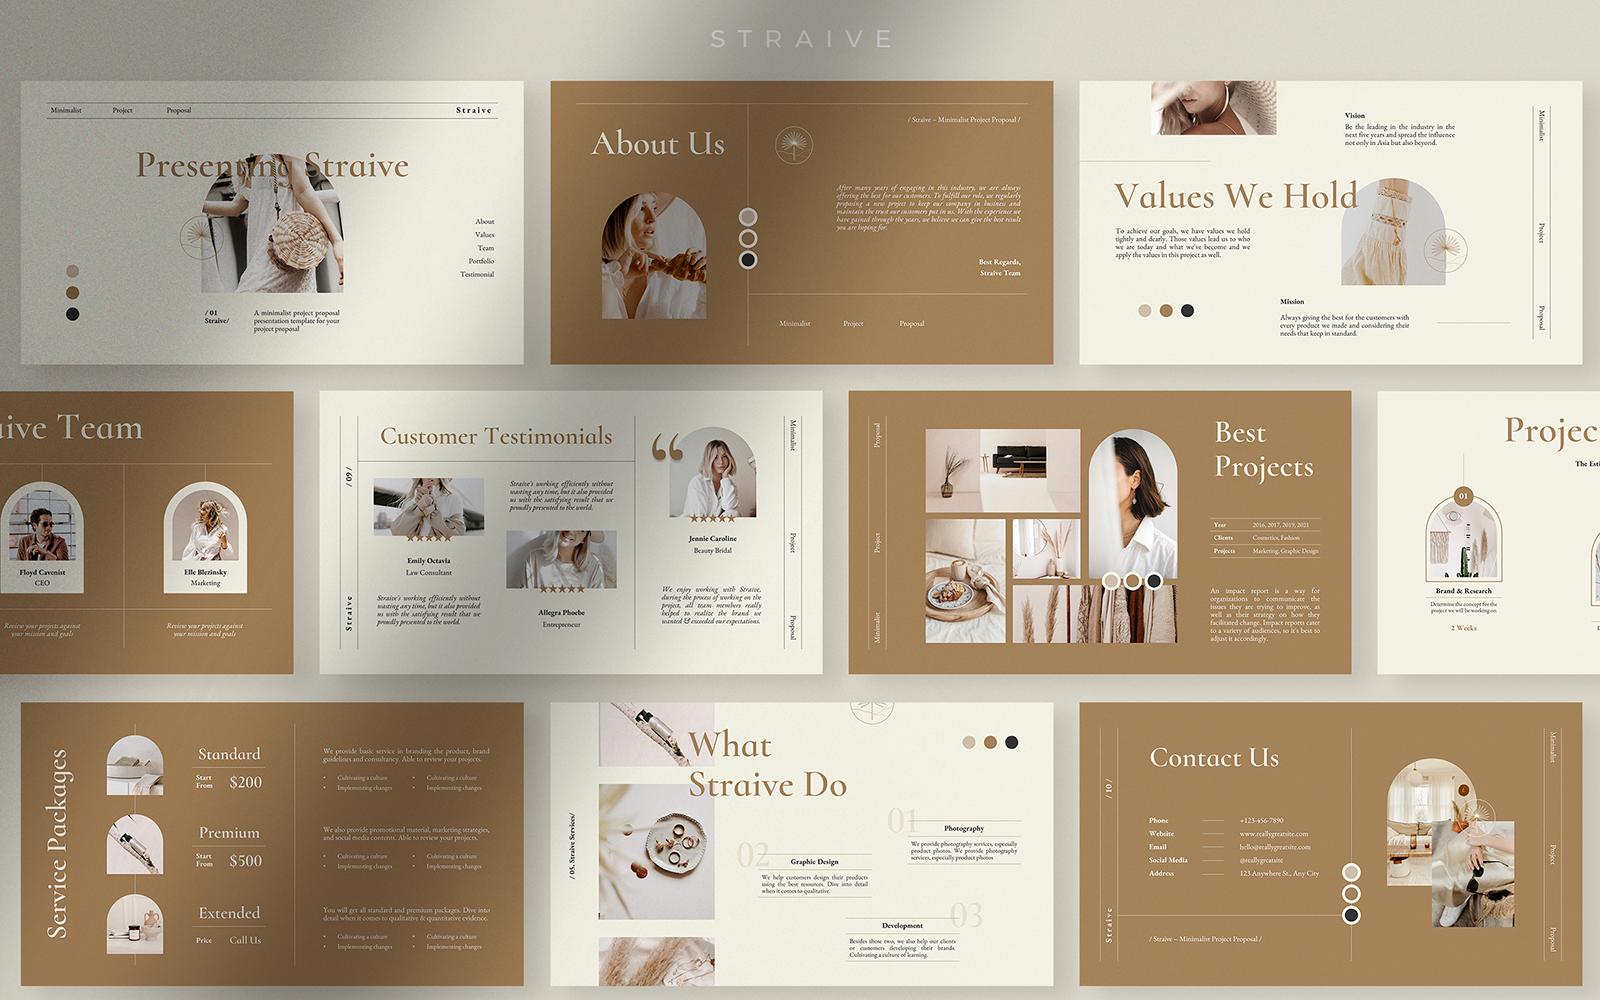 Straive - Peanut Butter Minimalist Project Proposal Presentation